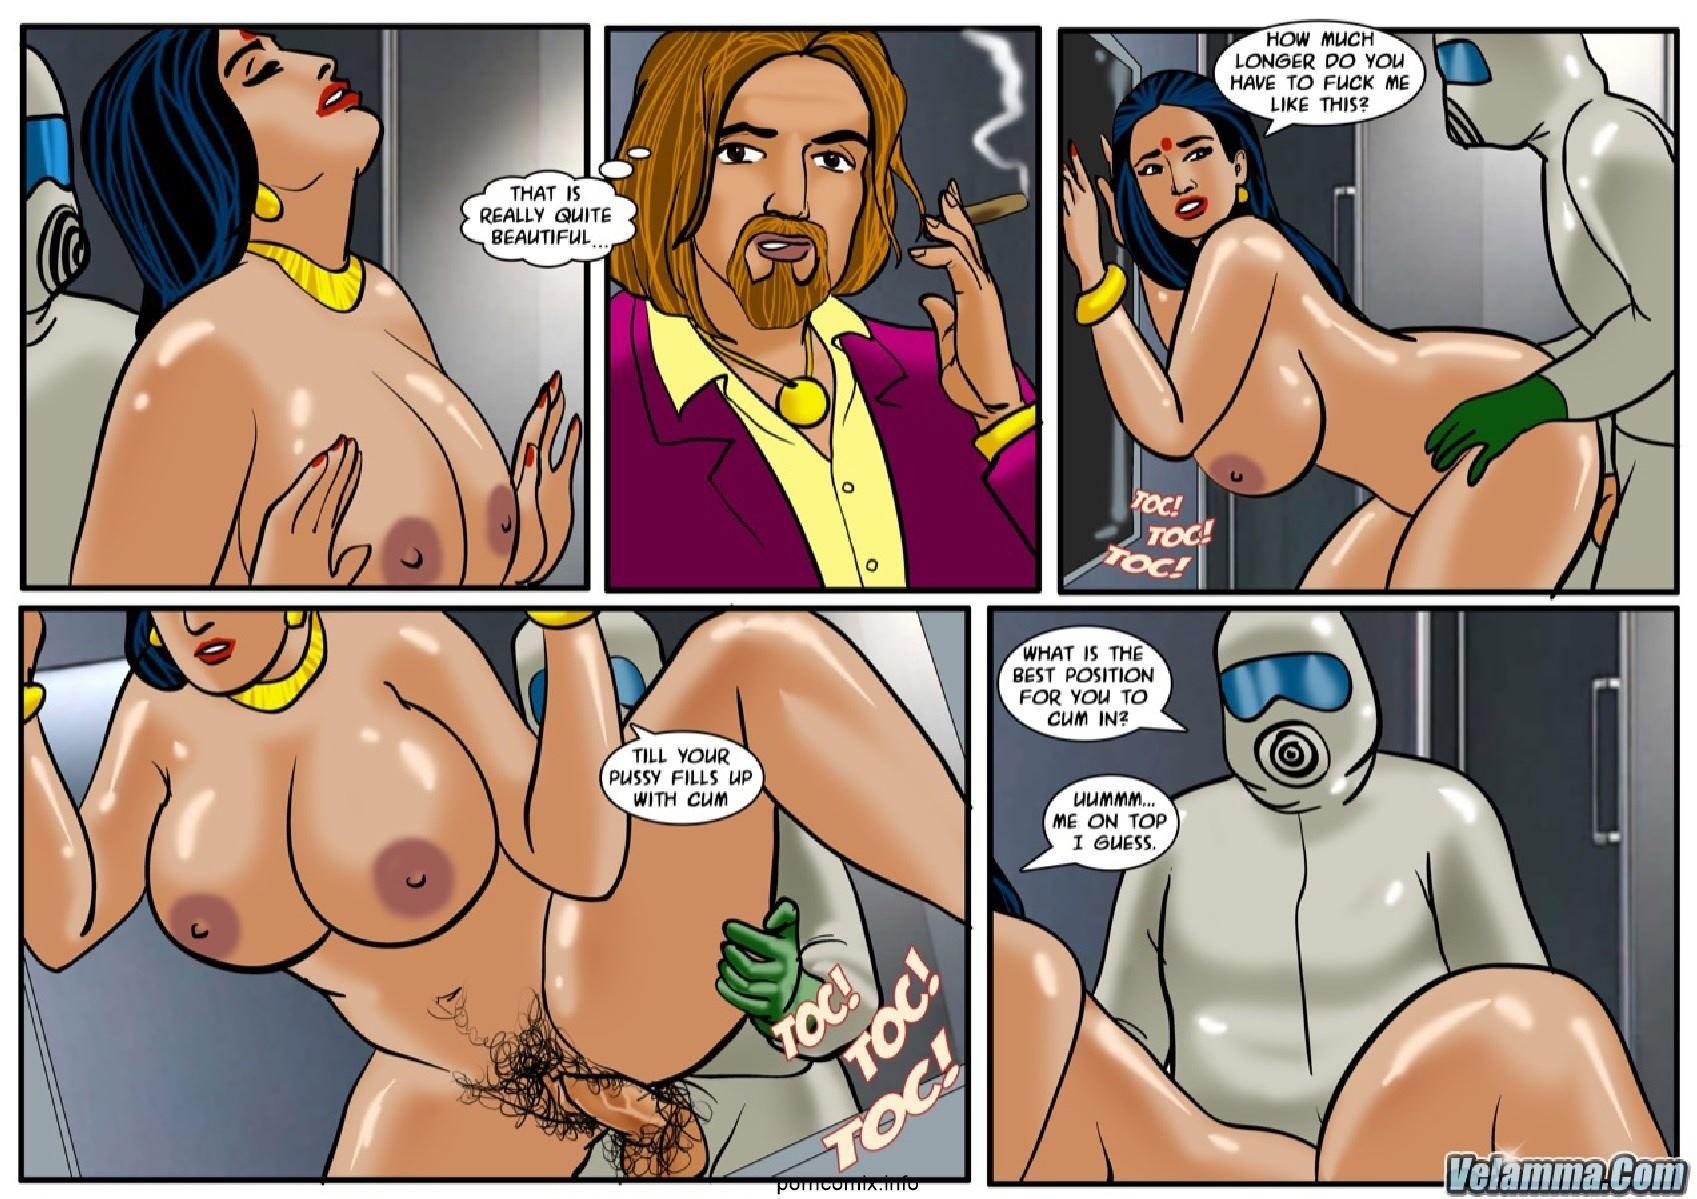 Big Boobs,Indian Porn,Velamma,Adult Comics,Velamma 58- Mischievous distressing